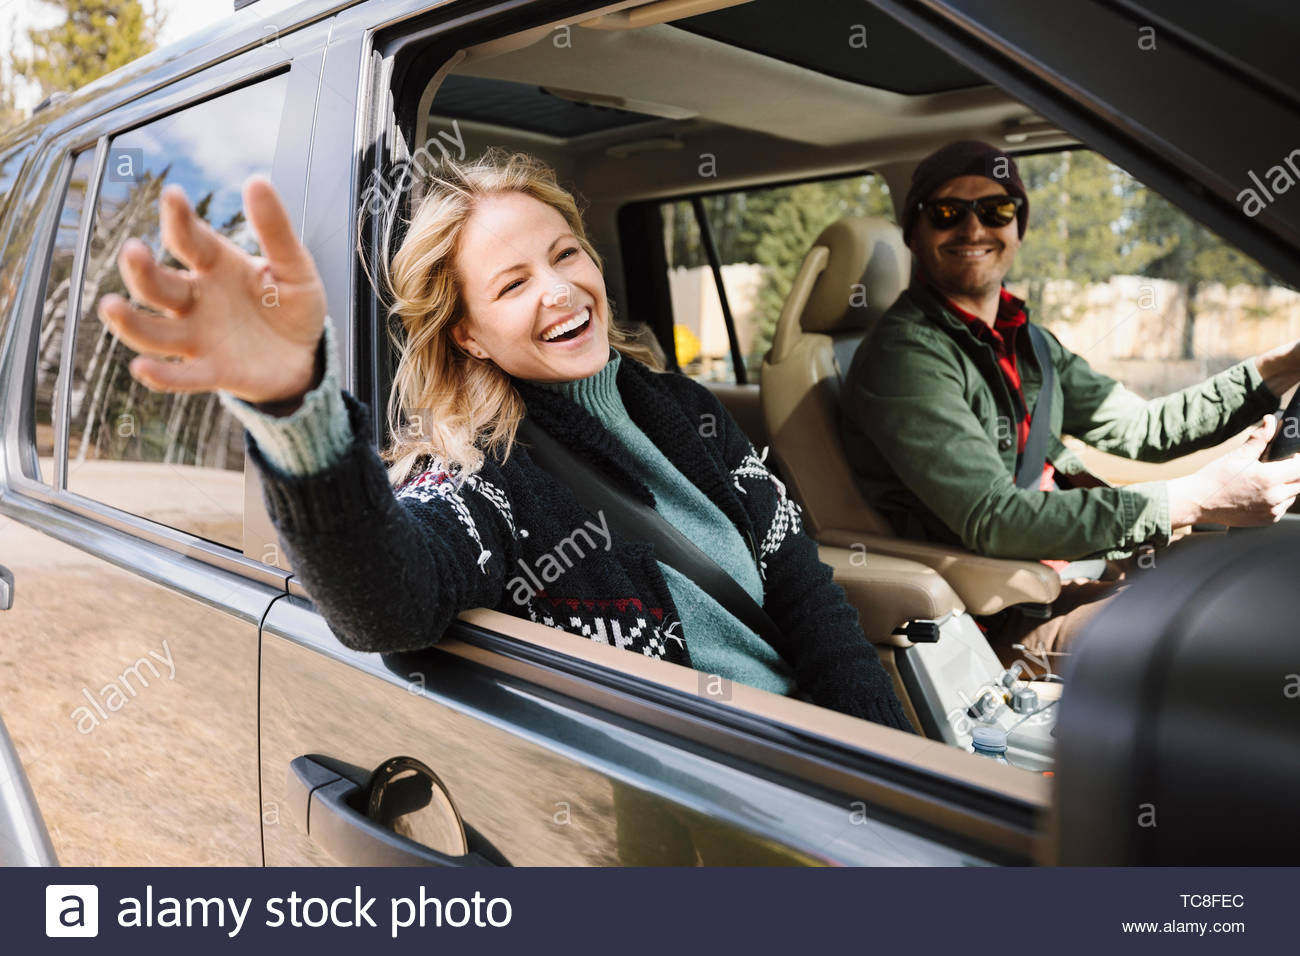 Carefree woman enjoying road trip in SUV - Stock Image